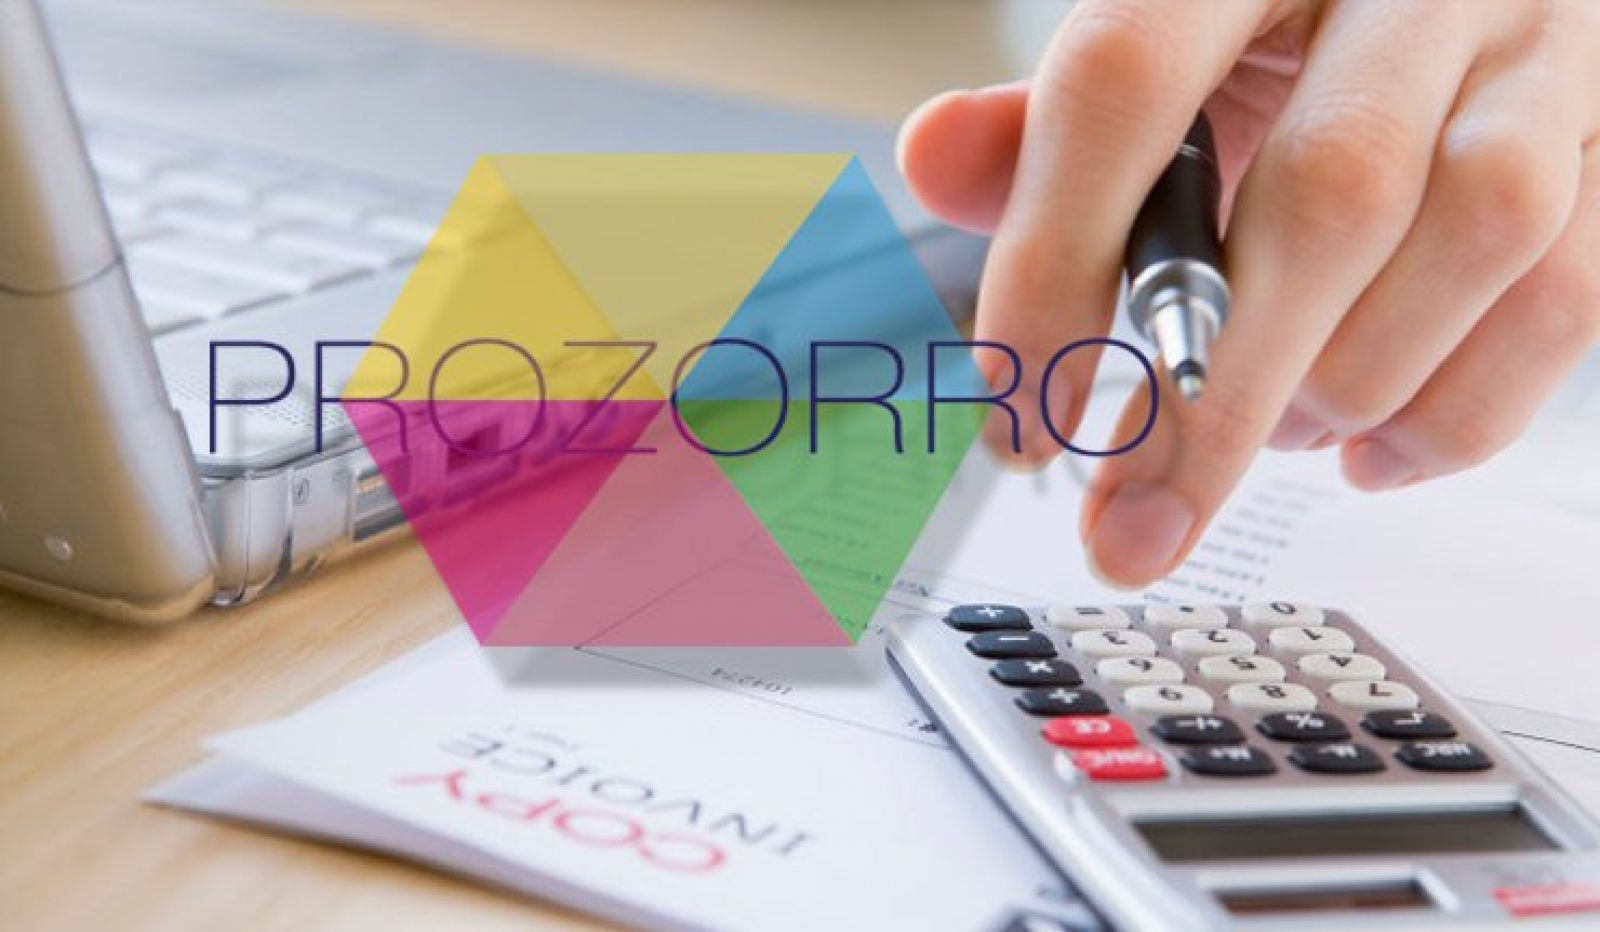 Zoom анонсировал сервис онлайн-мероприятий OnZoom и продукт Zapps для интеграции сторонних приложений